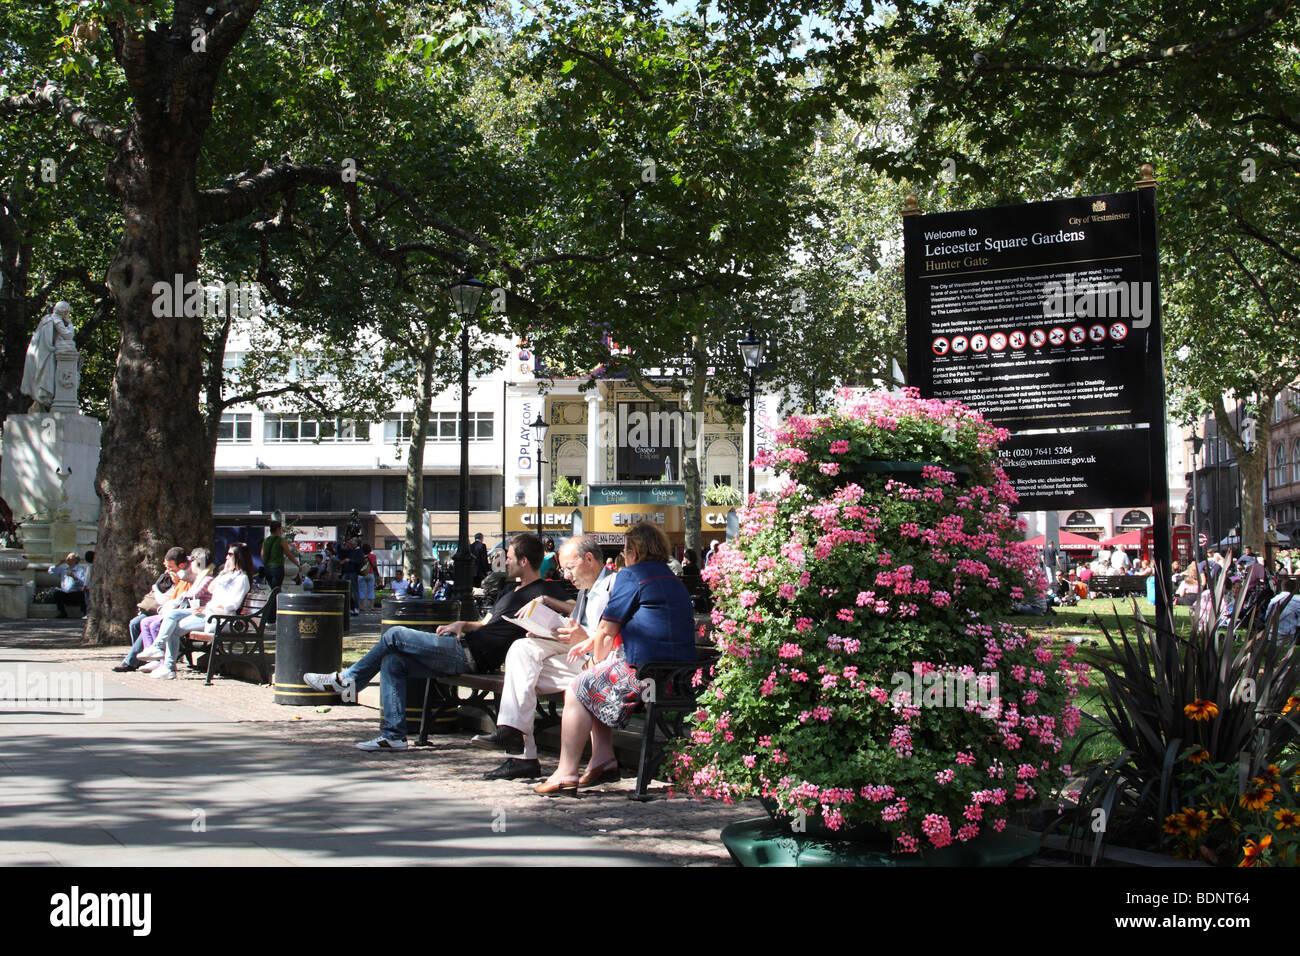 Leicester Square Gardens, London, England, U.K. - Stock Image